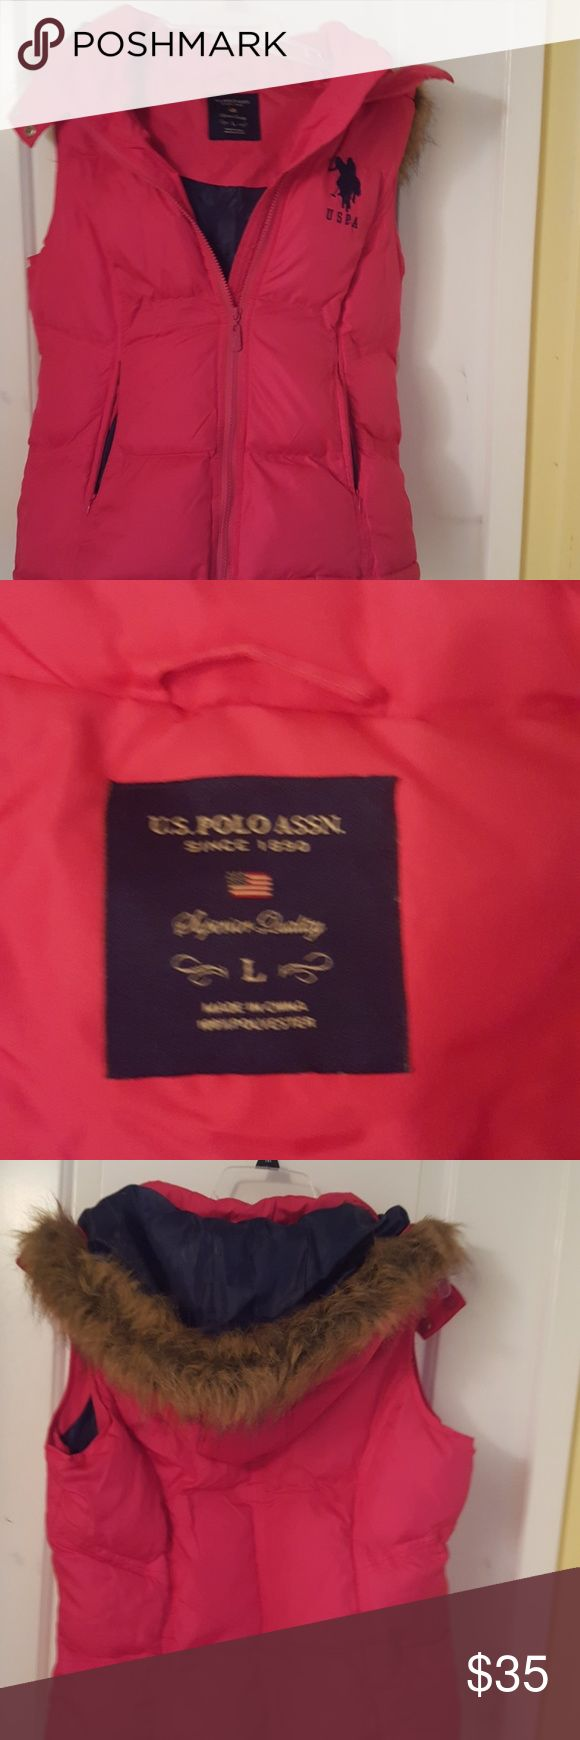 Ralph Lauren Hooded Vest Polo Ralph Lauren Hooded puffy vest, bright pink, never worn. Polo by Ralph Lauren Jackets & Coats Vests